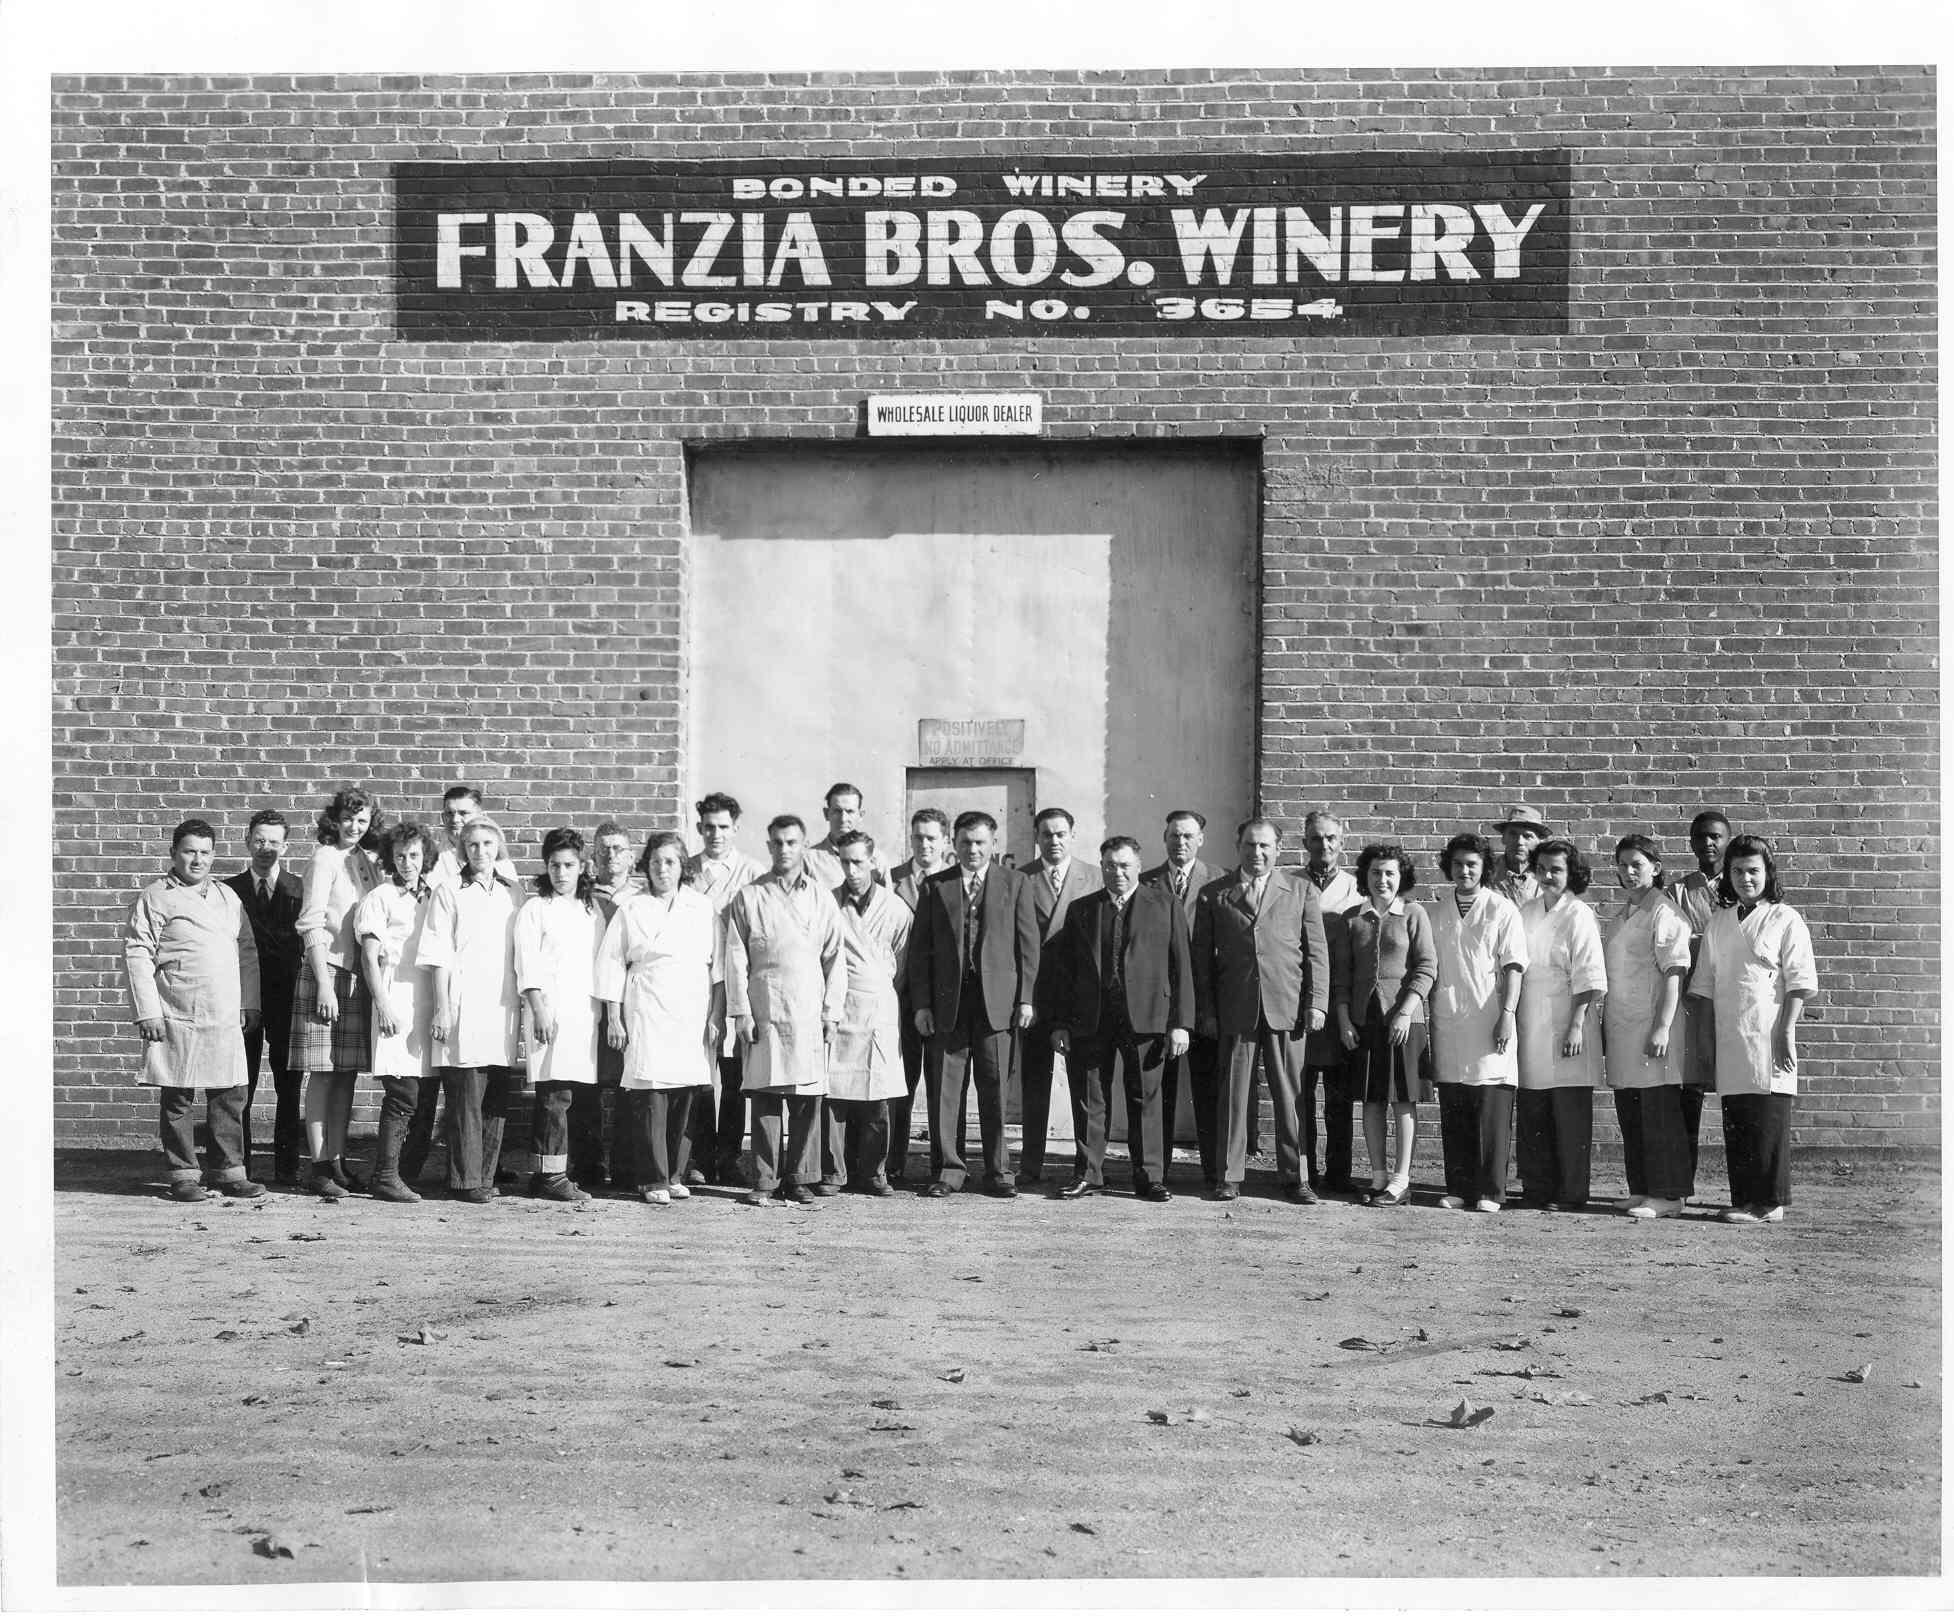 Franzia Brothers Winery